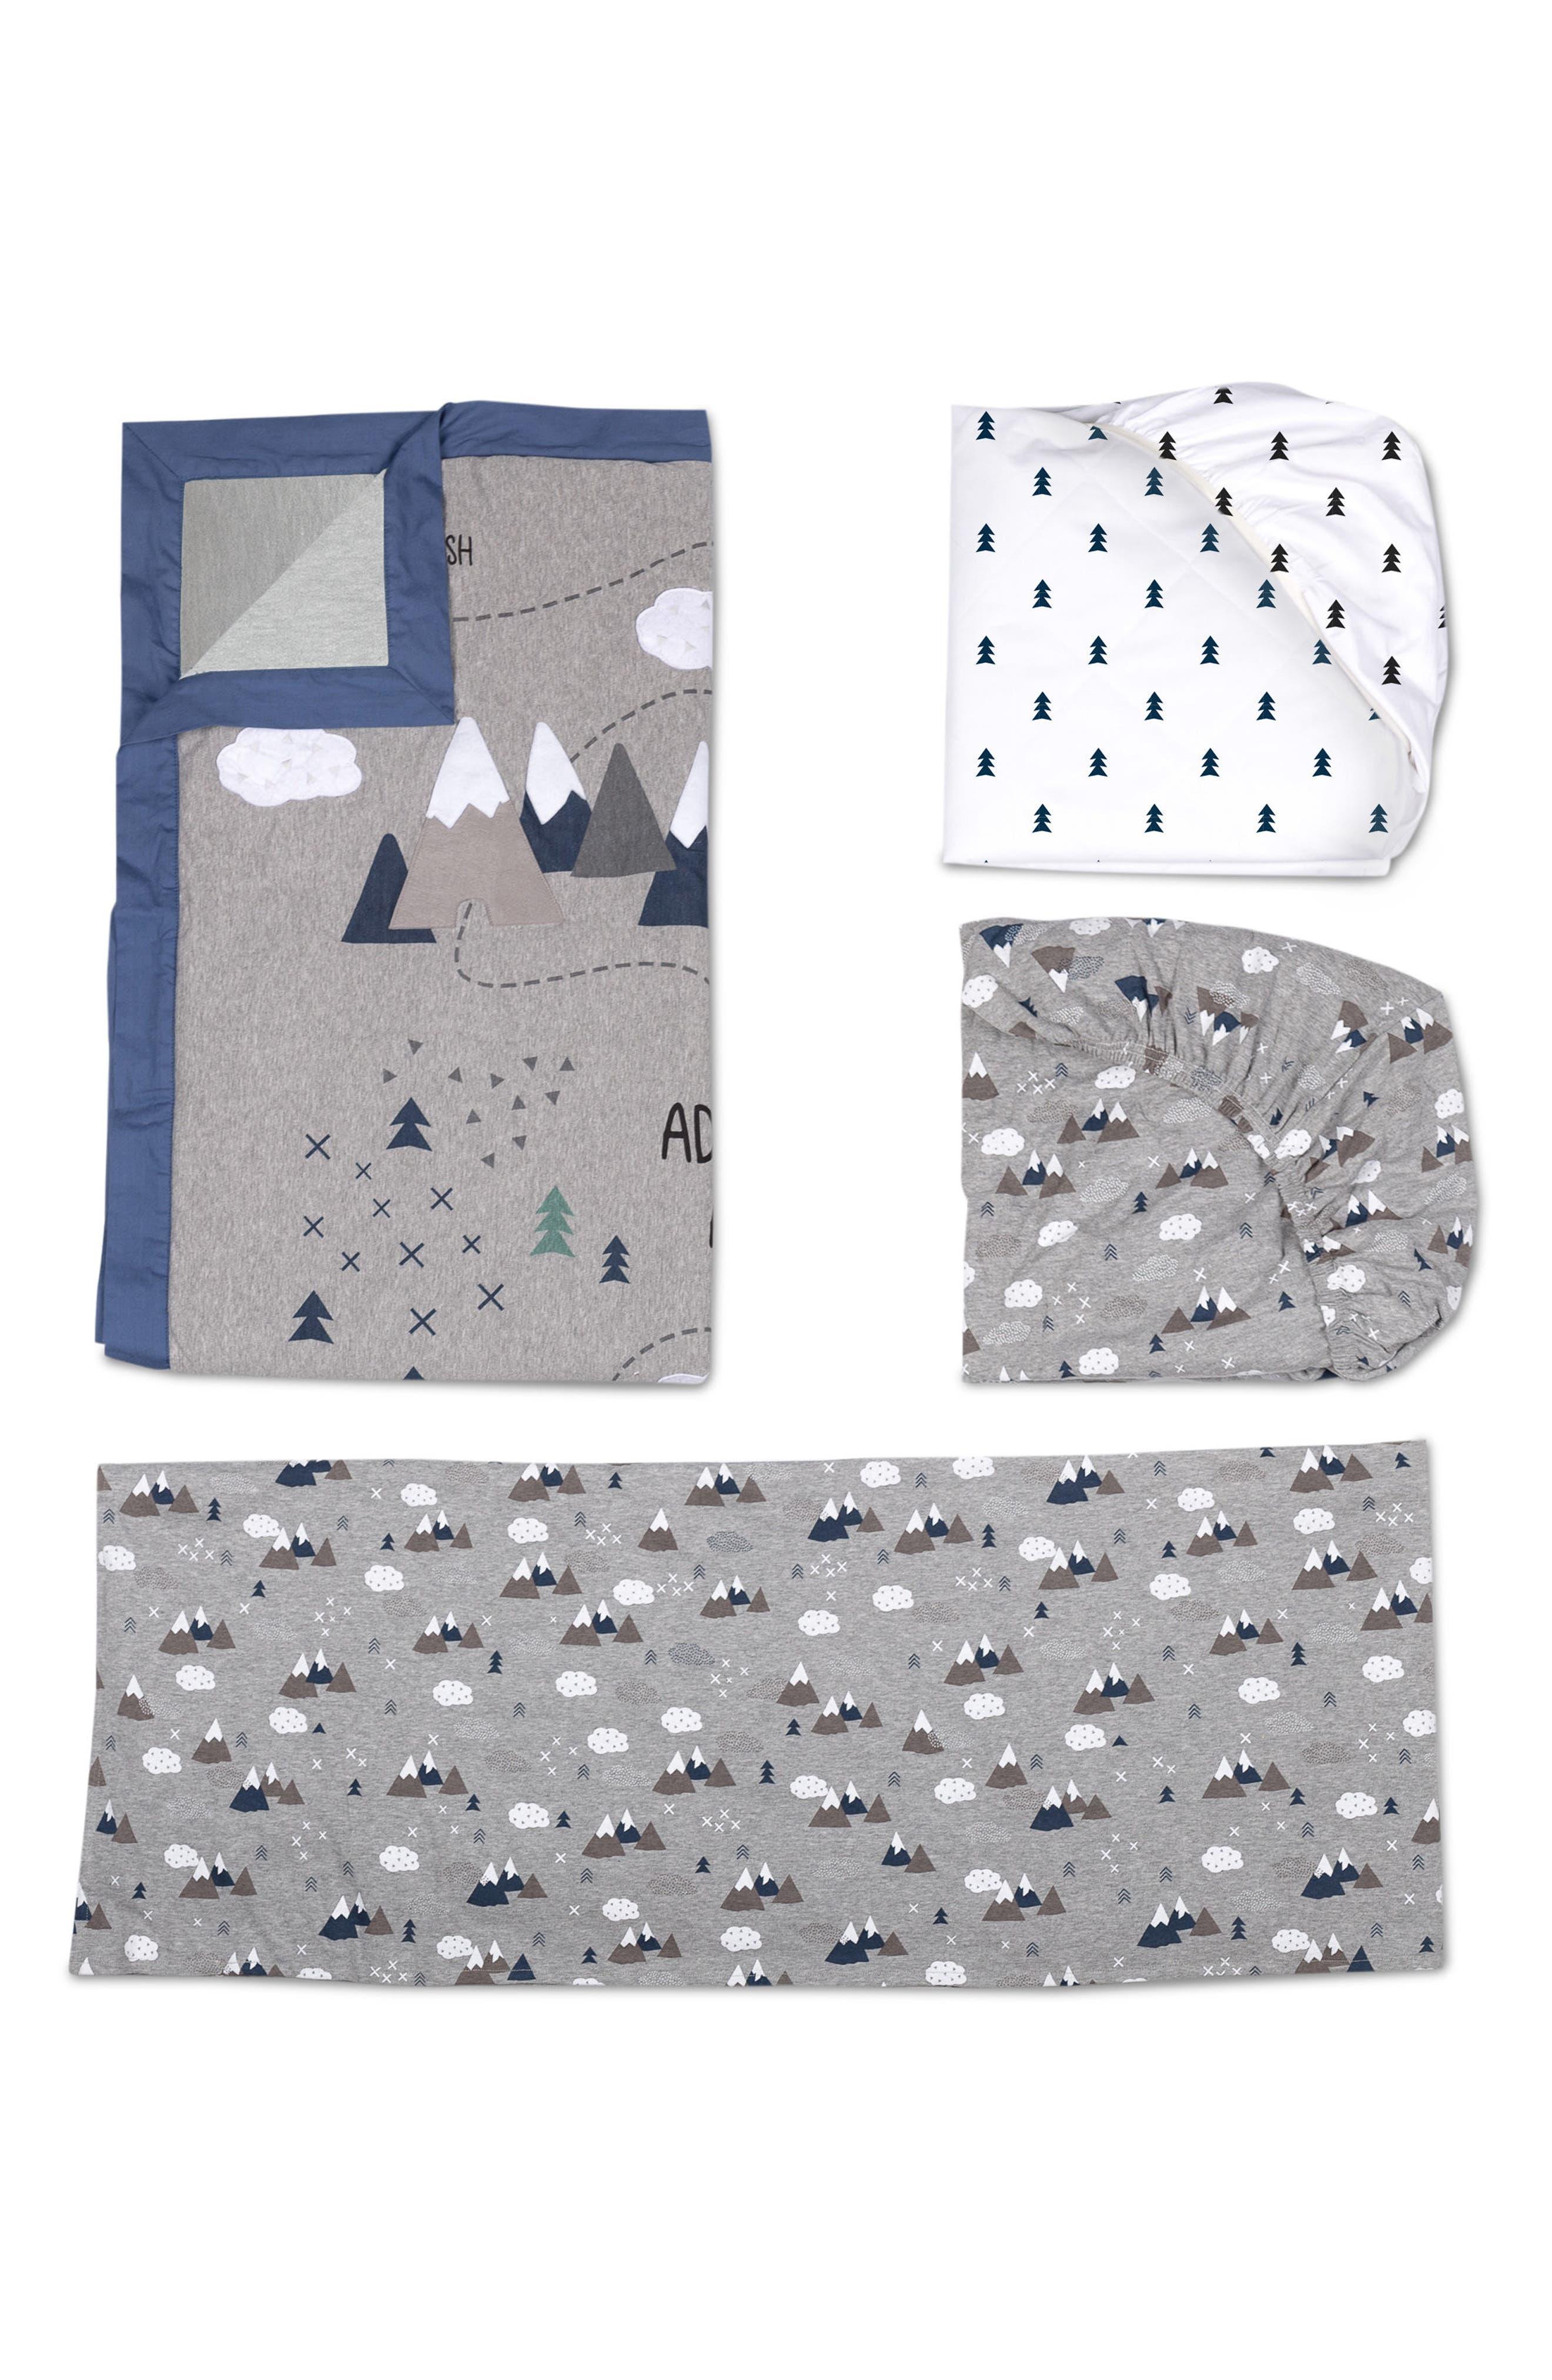 Peaks 4-Piece Crib Bedding Set,                             Main thumbnail 1, color,                             PEAKS